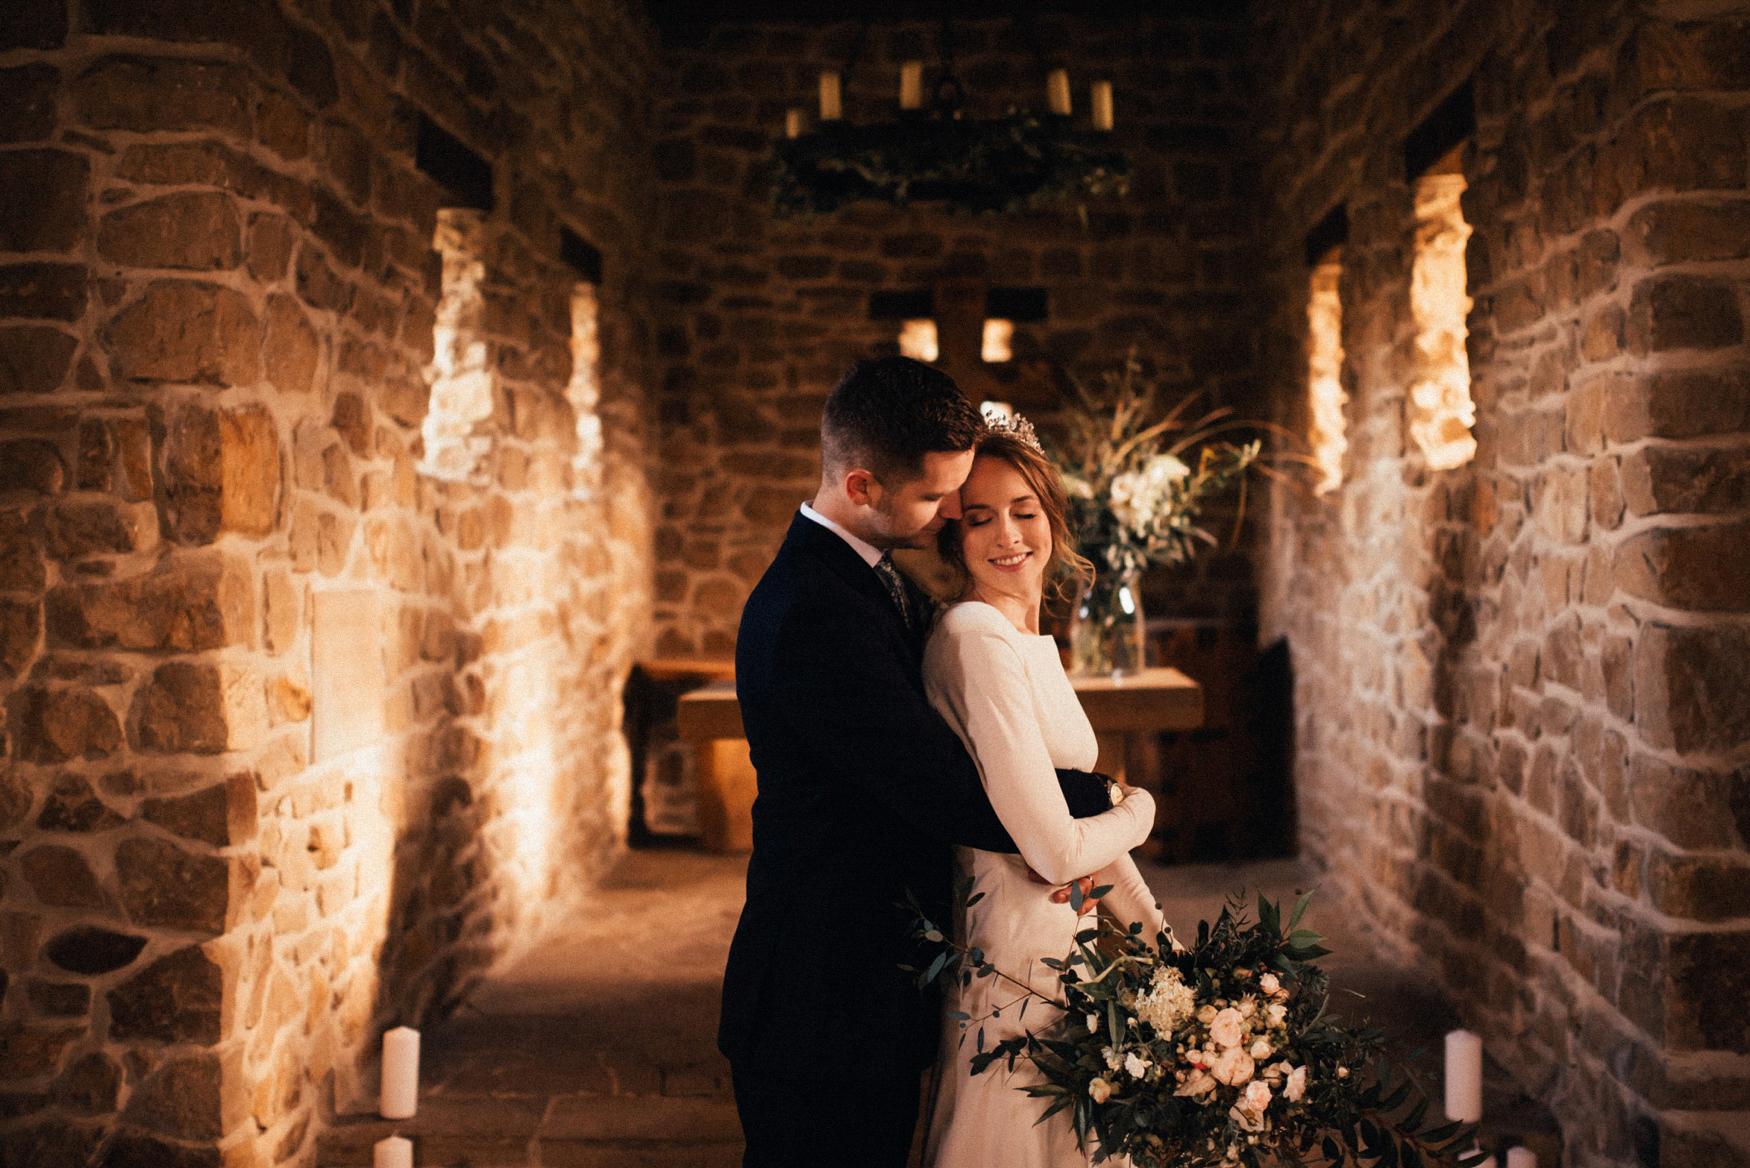 3 czech countryside rustic wedding - svatba zikmundov002.jpg